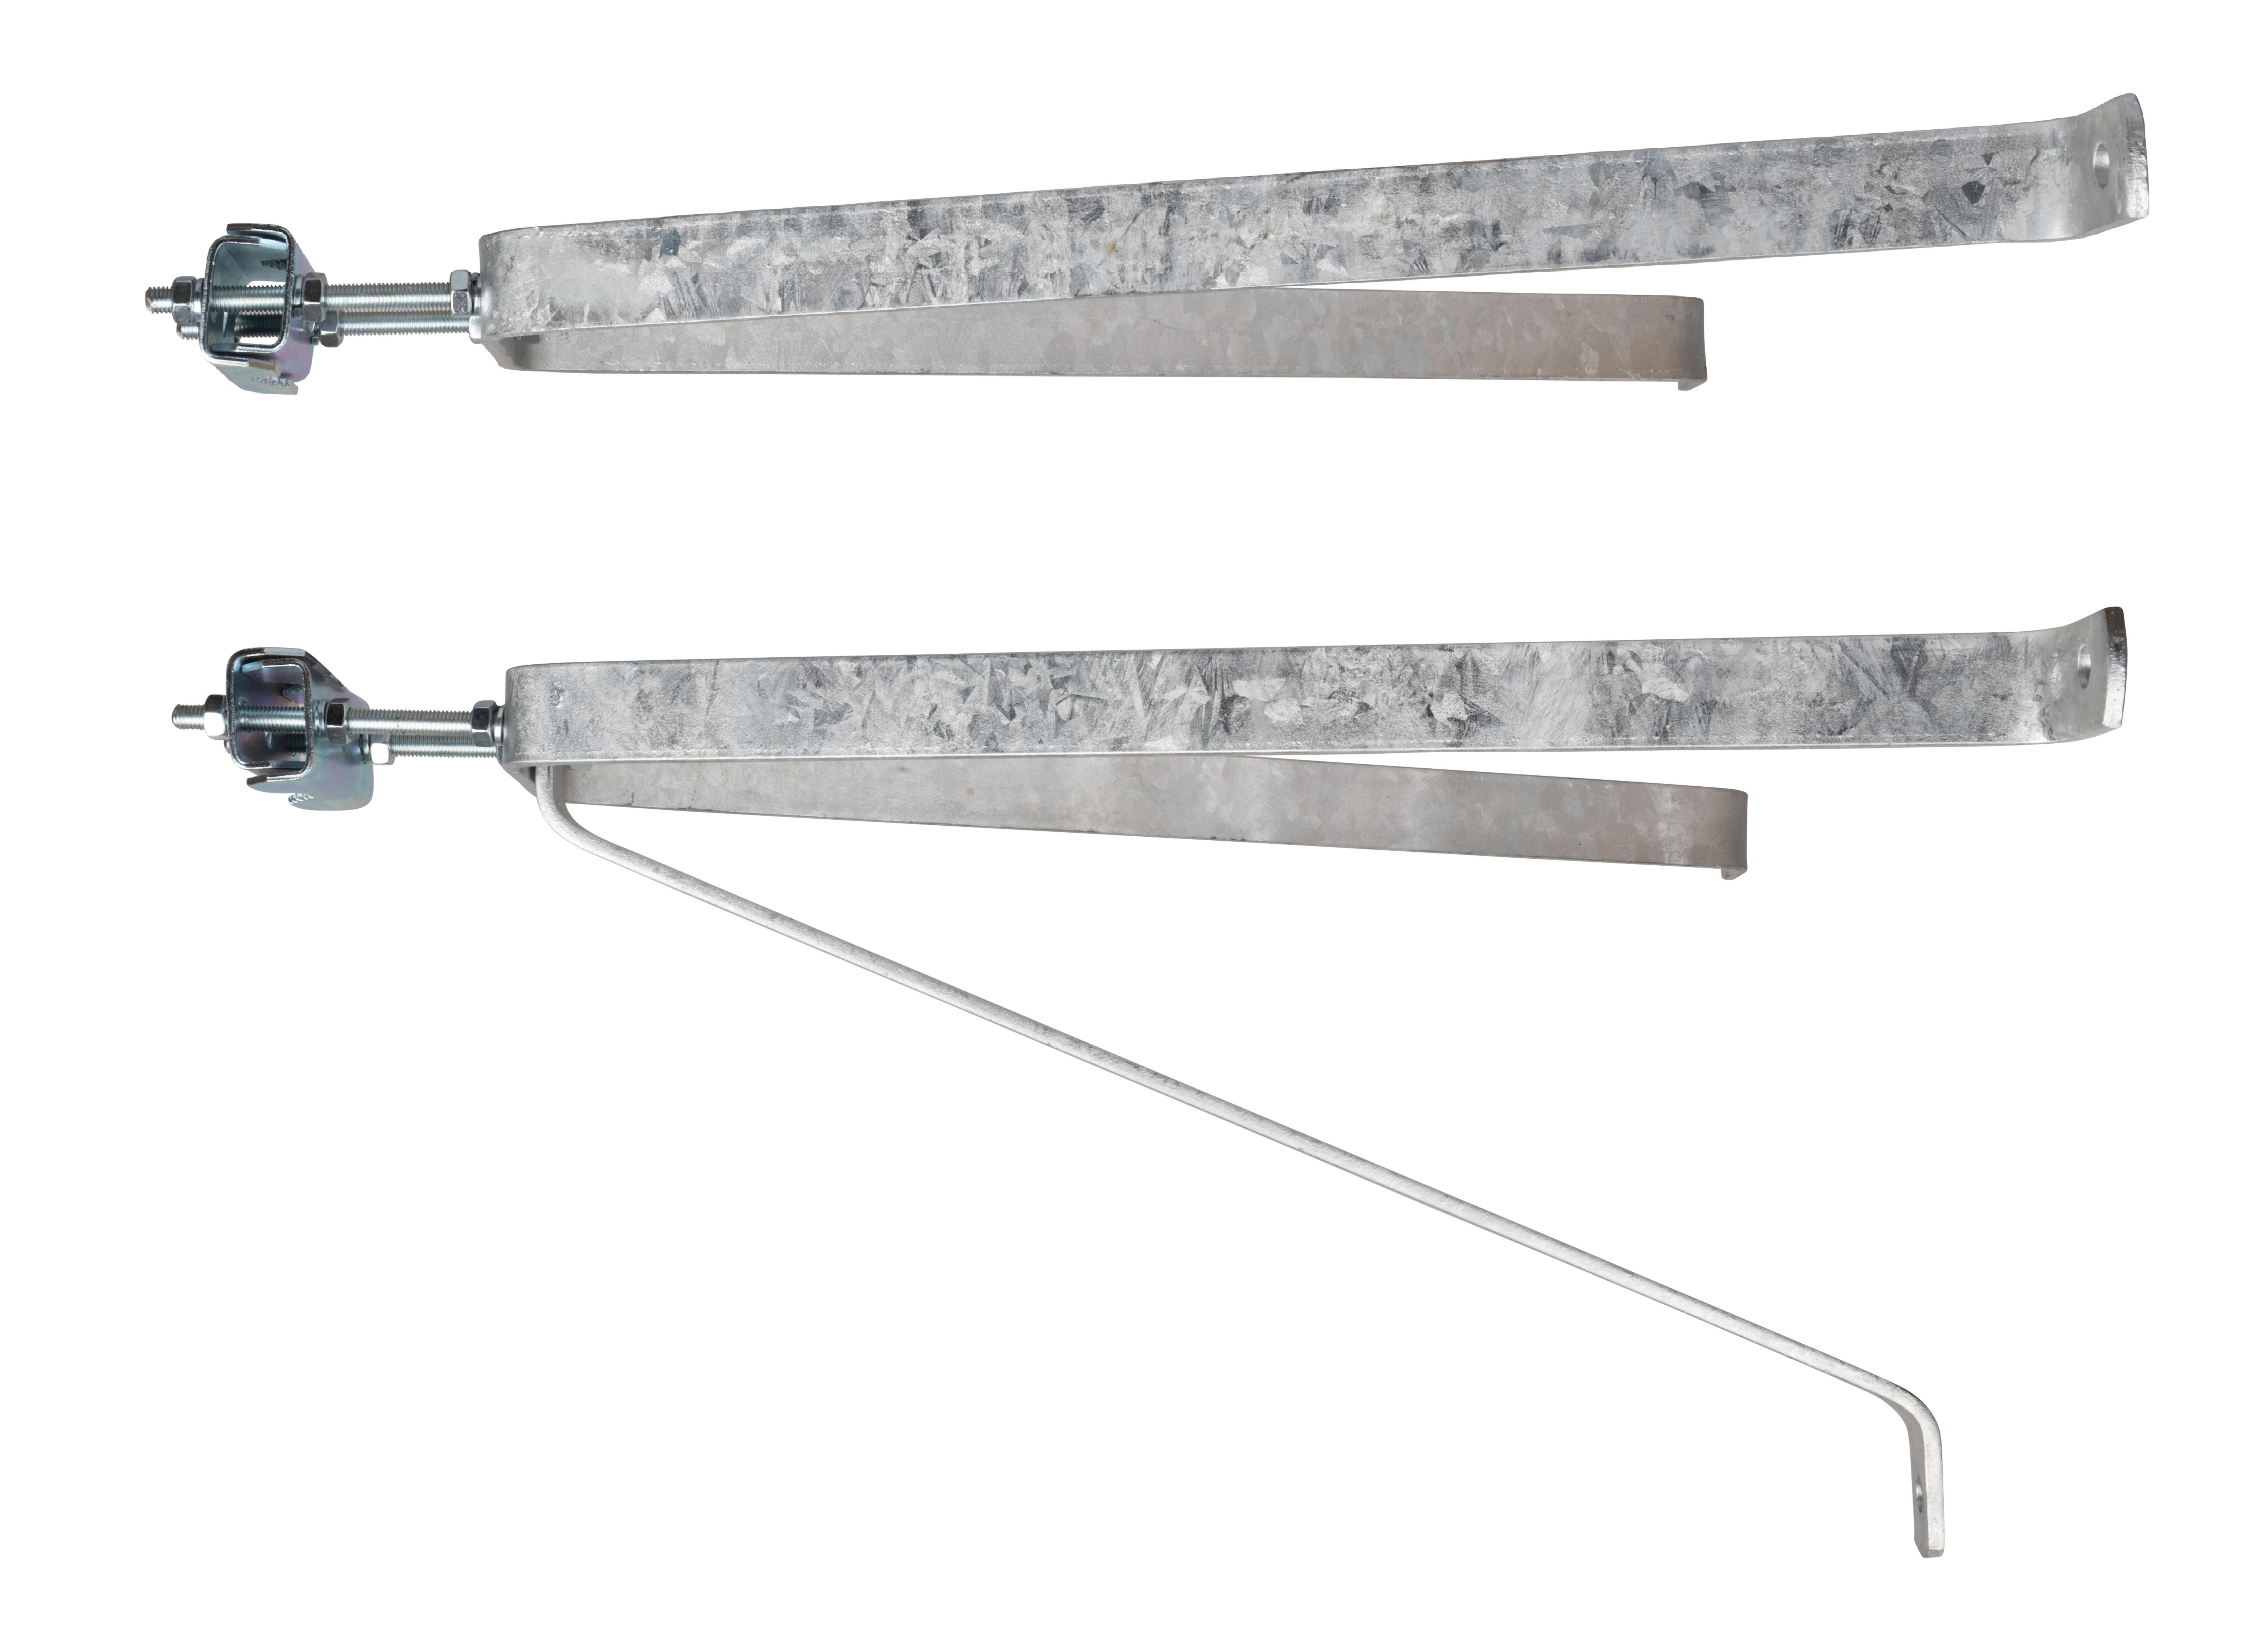 1 Stk SAT Mastbügel Garnitur 50cm, Mastrohre D=38mm-60mm, Stahl HSATWT50S-